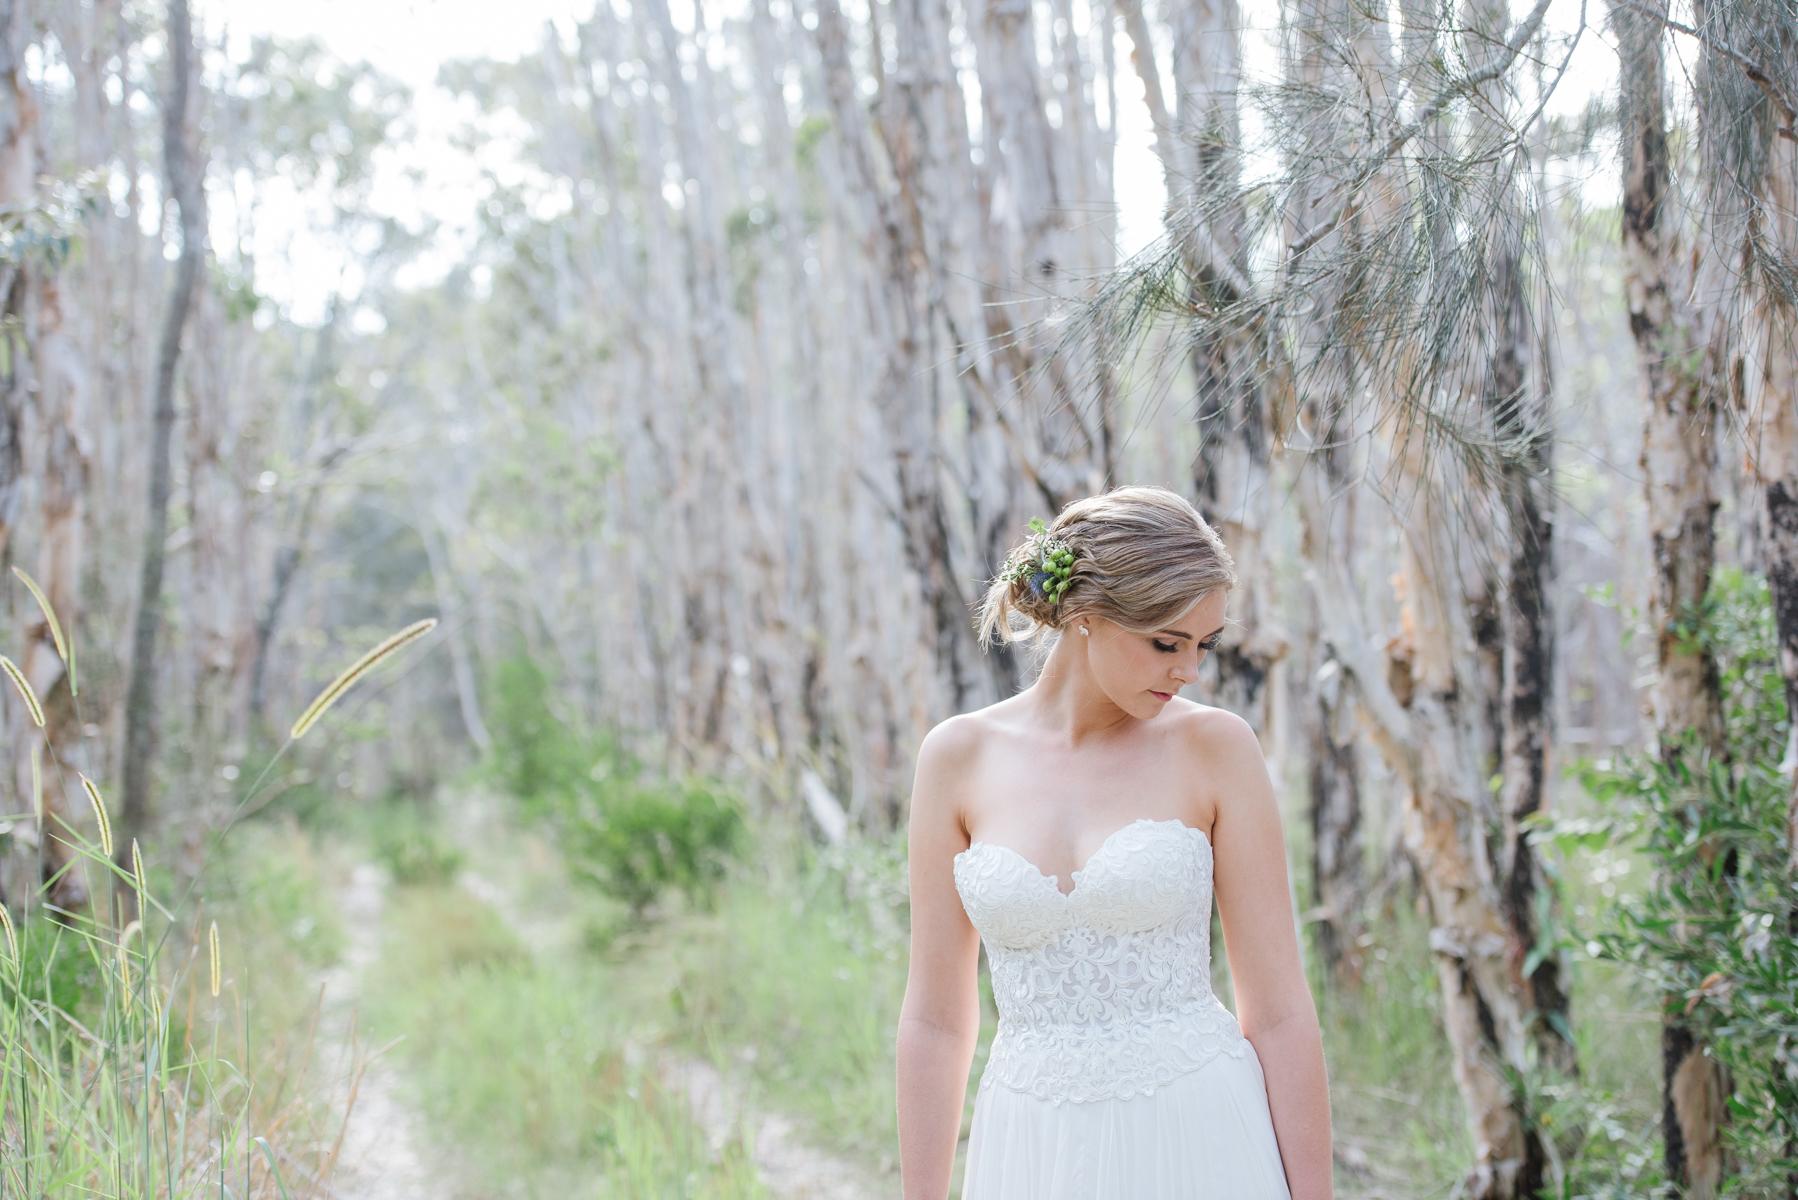 Cass and Josh- wedding photographer, byron bay wedding and family photographer, tweed heads wedding and family photography-446.jpg